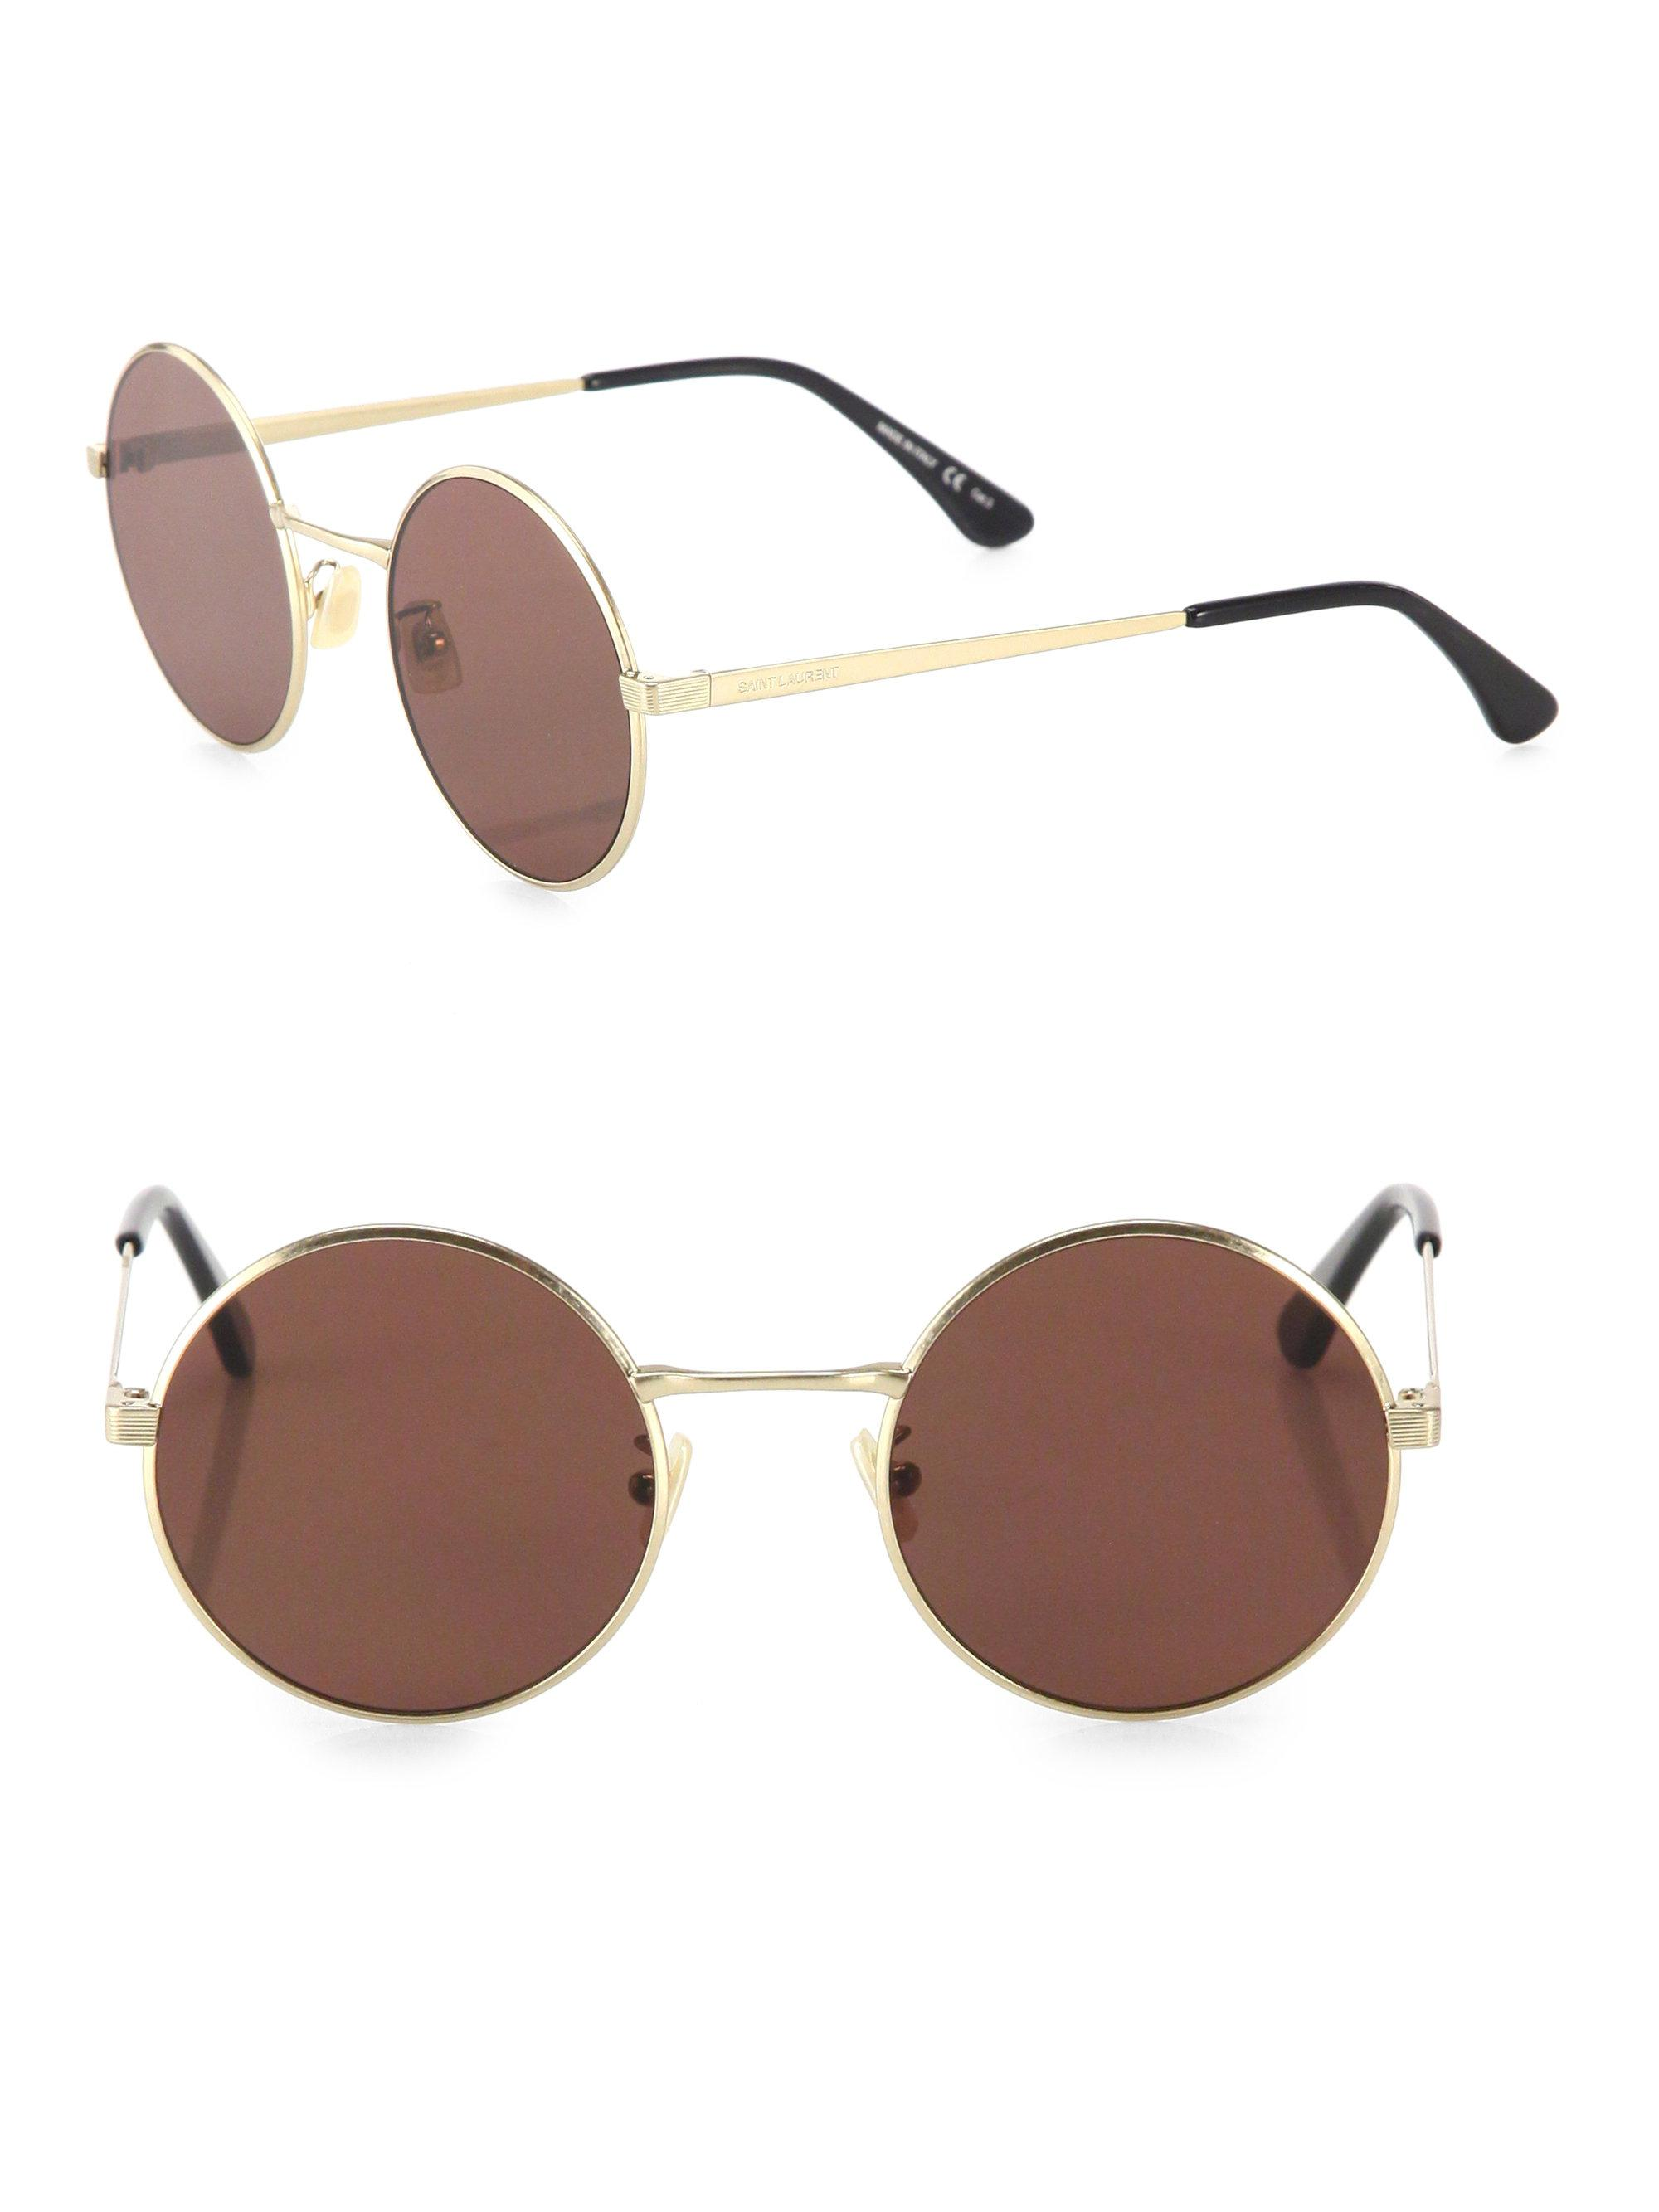 15643f06a6 Saint Laurent Sl 136 Zero 52mm Round Sunglasses in Metallic - Lyst